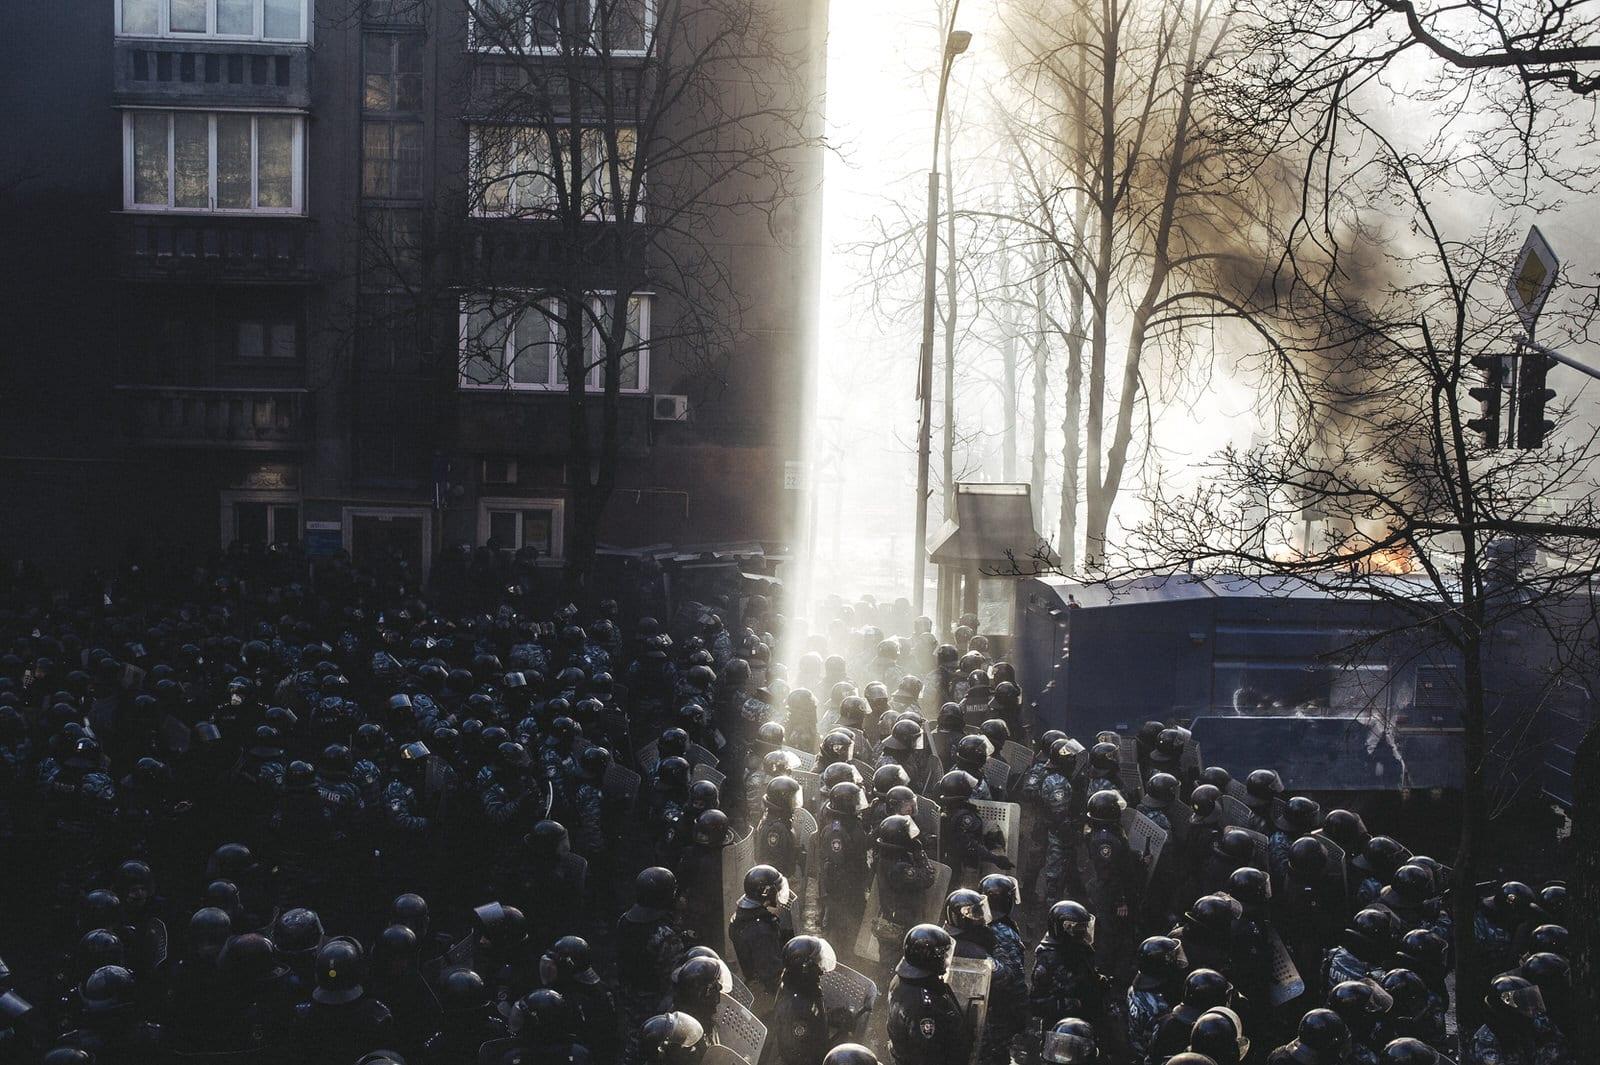 Riot police began to storm Maidan after clashes on Shelkovichna street. Kiev, 18th February 2014 (RUS)Беркут идет штурмом на майдан после столкновения на ул. Шелковчиная.